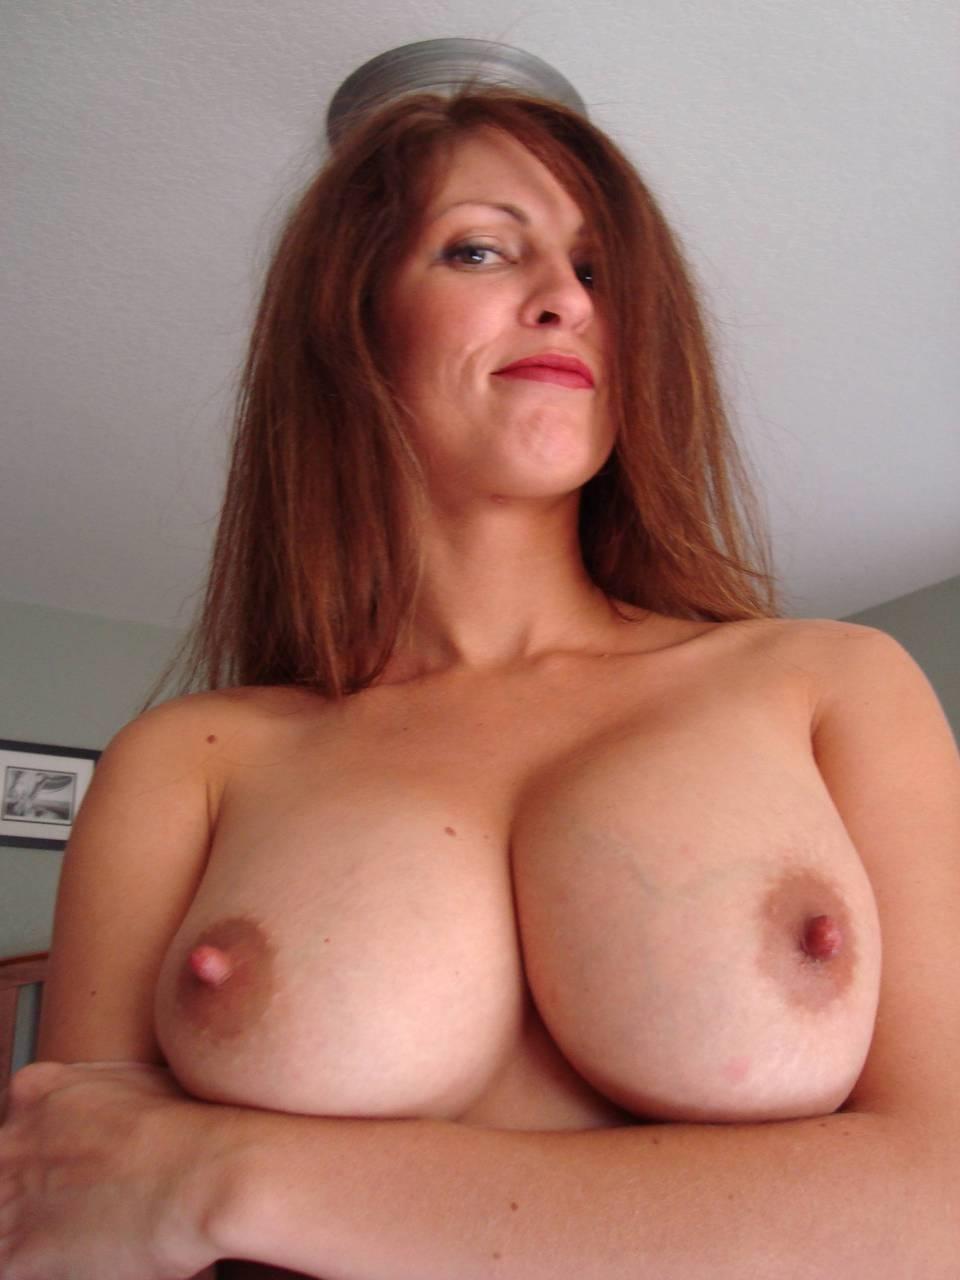 Mature big boobed nudes